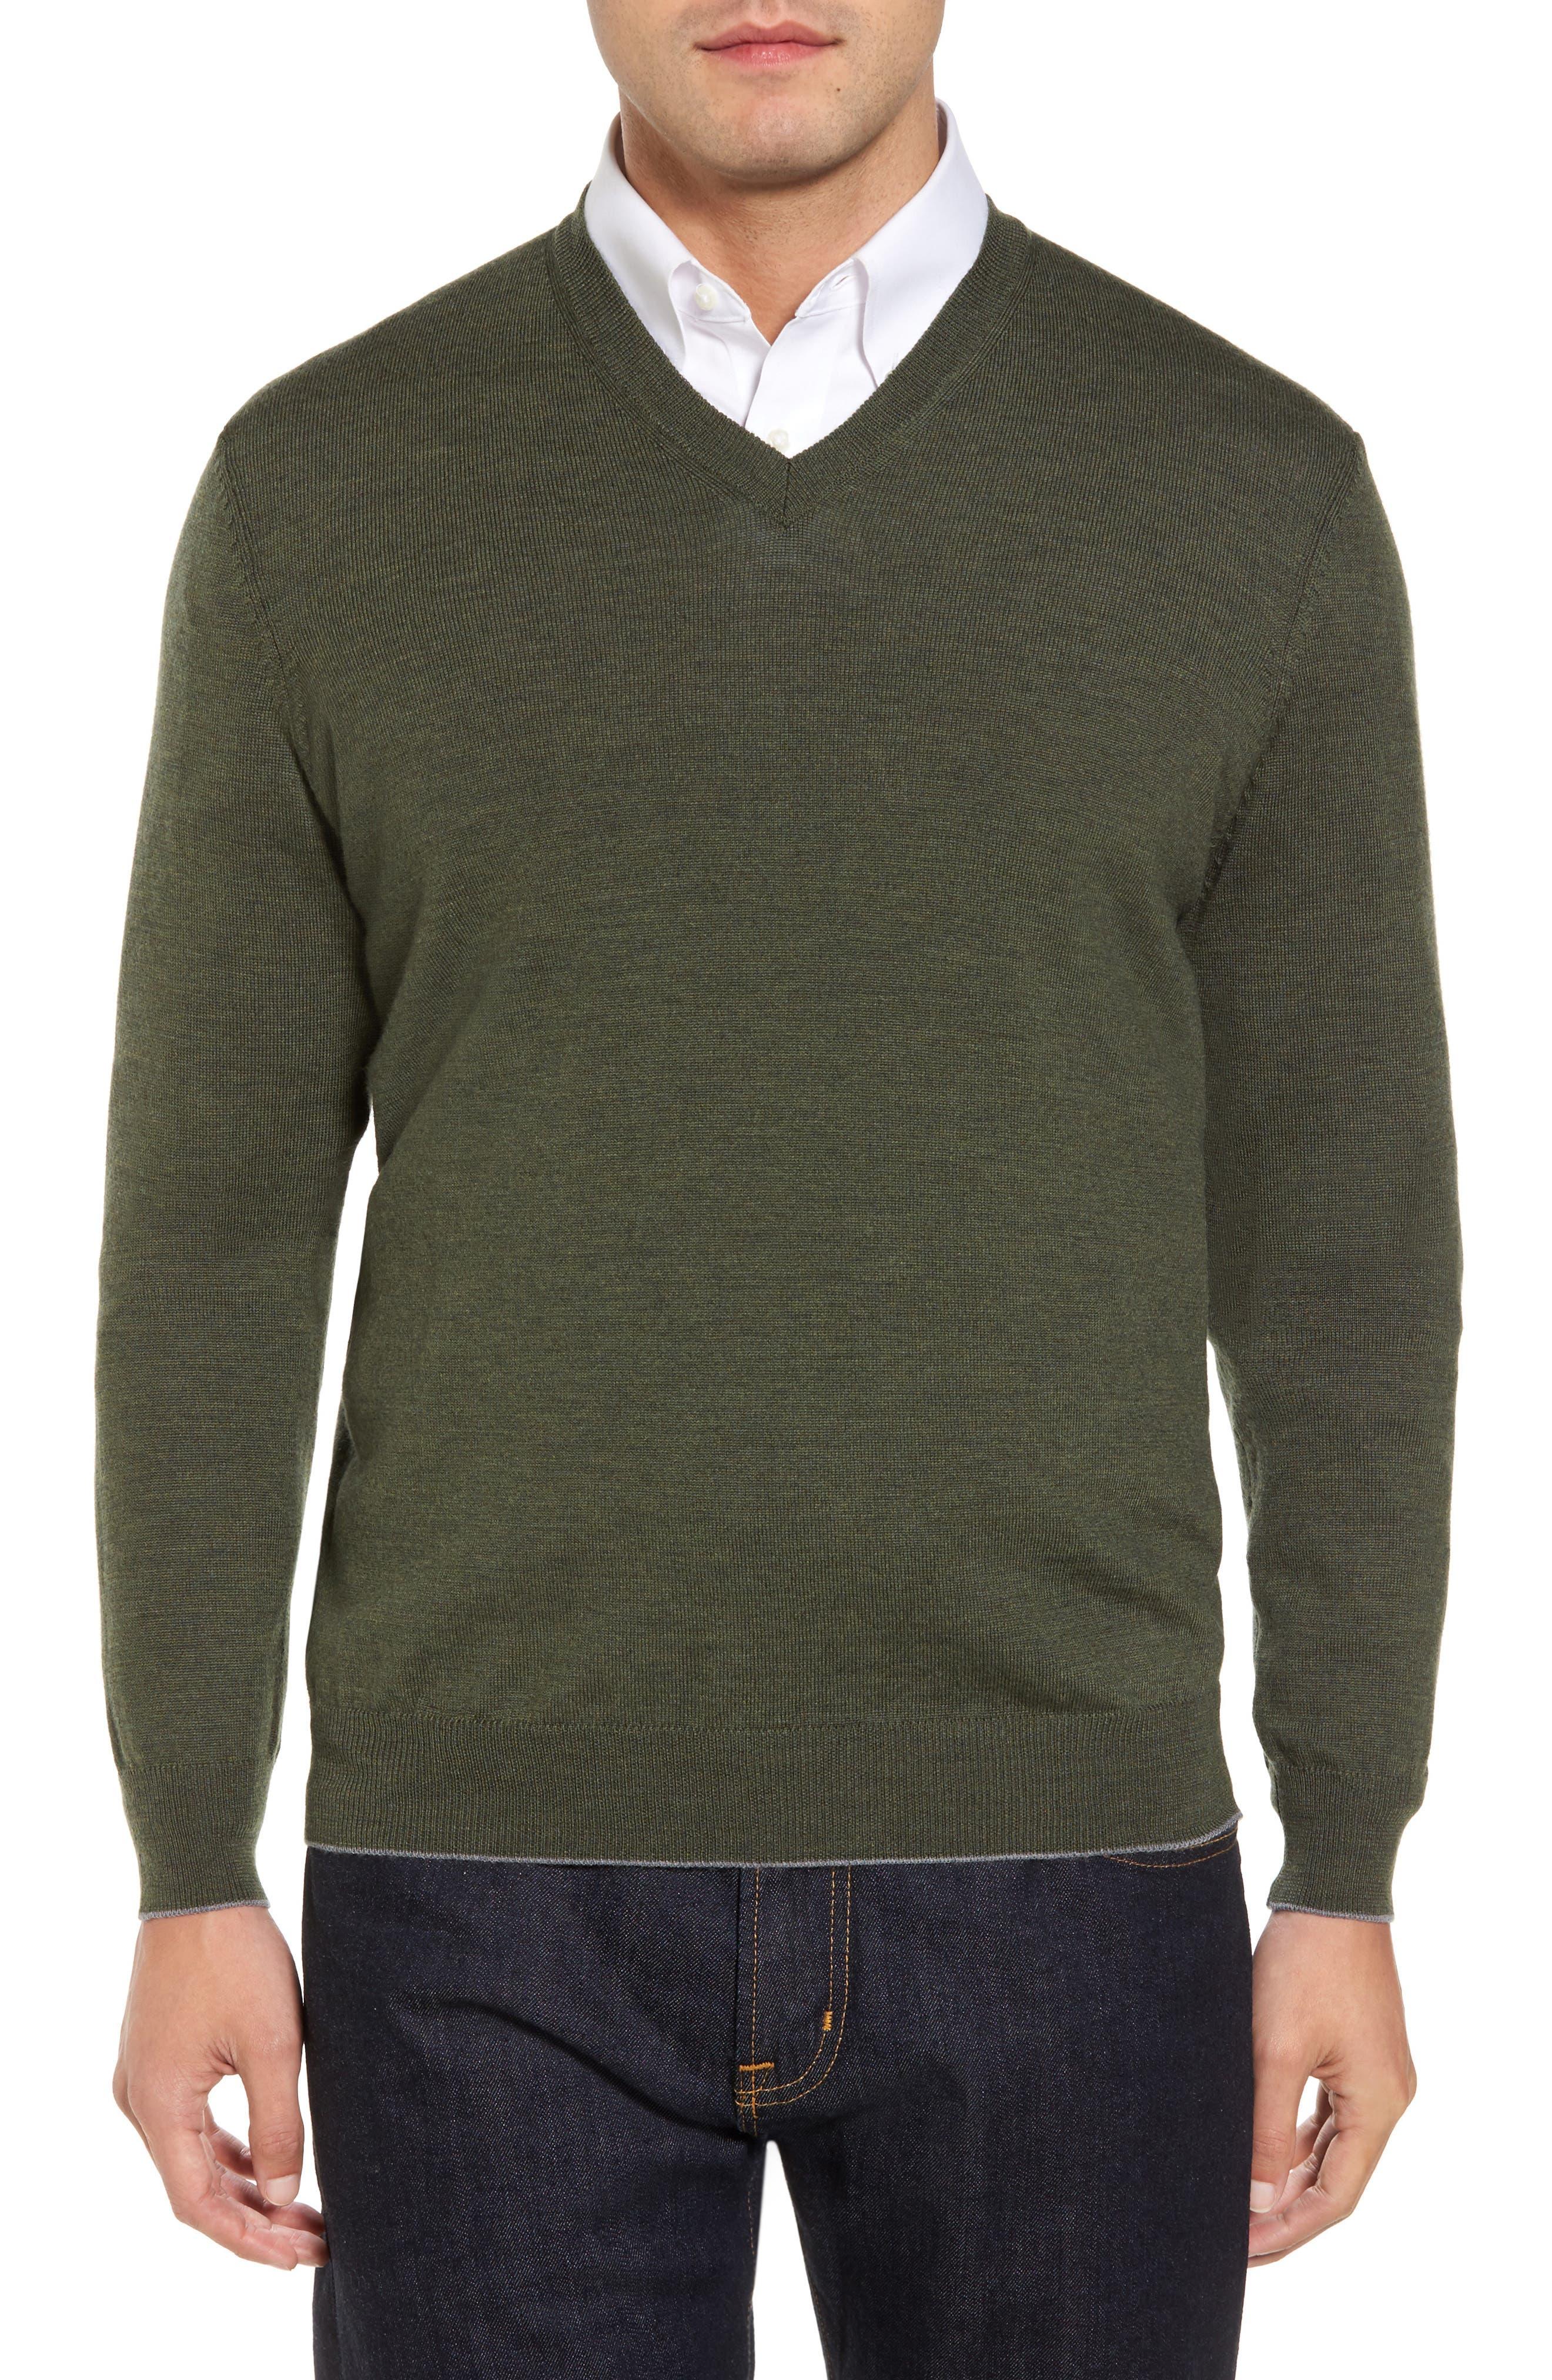 Alternate Image 1 Selected - Thomas Dean Merino Wool Blend V-Neck Sweater